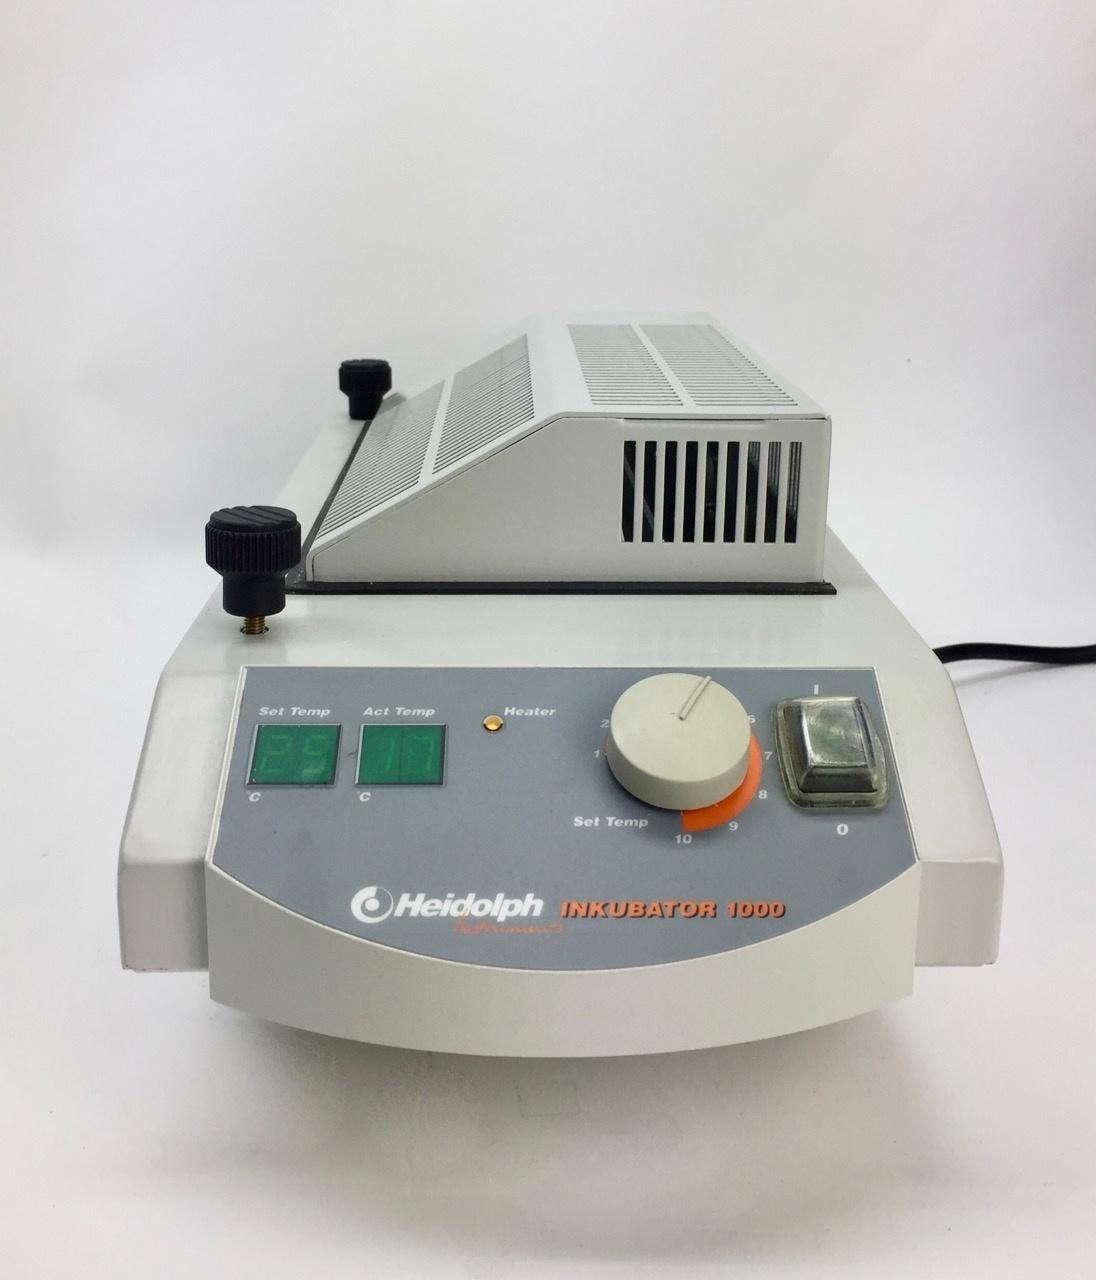 Heidolph Instruments Heidolph Heizmodul Inkubator 1000